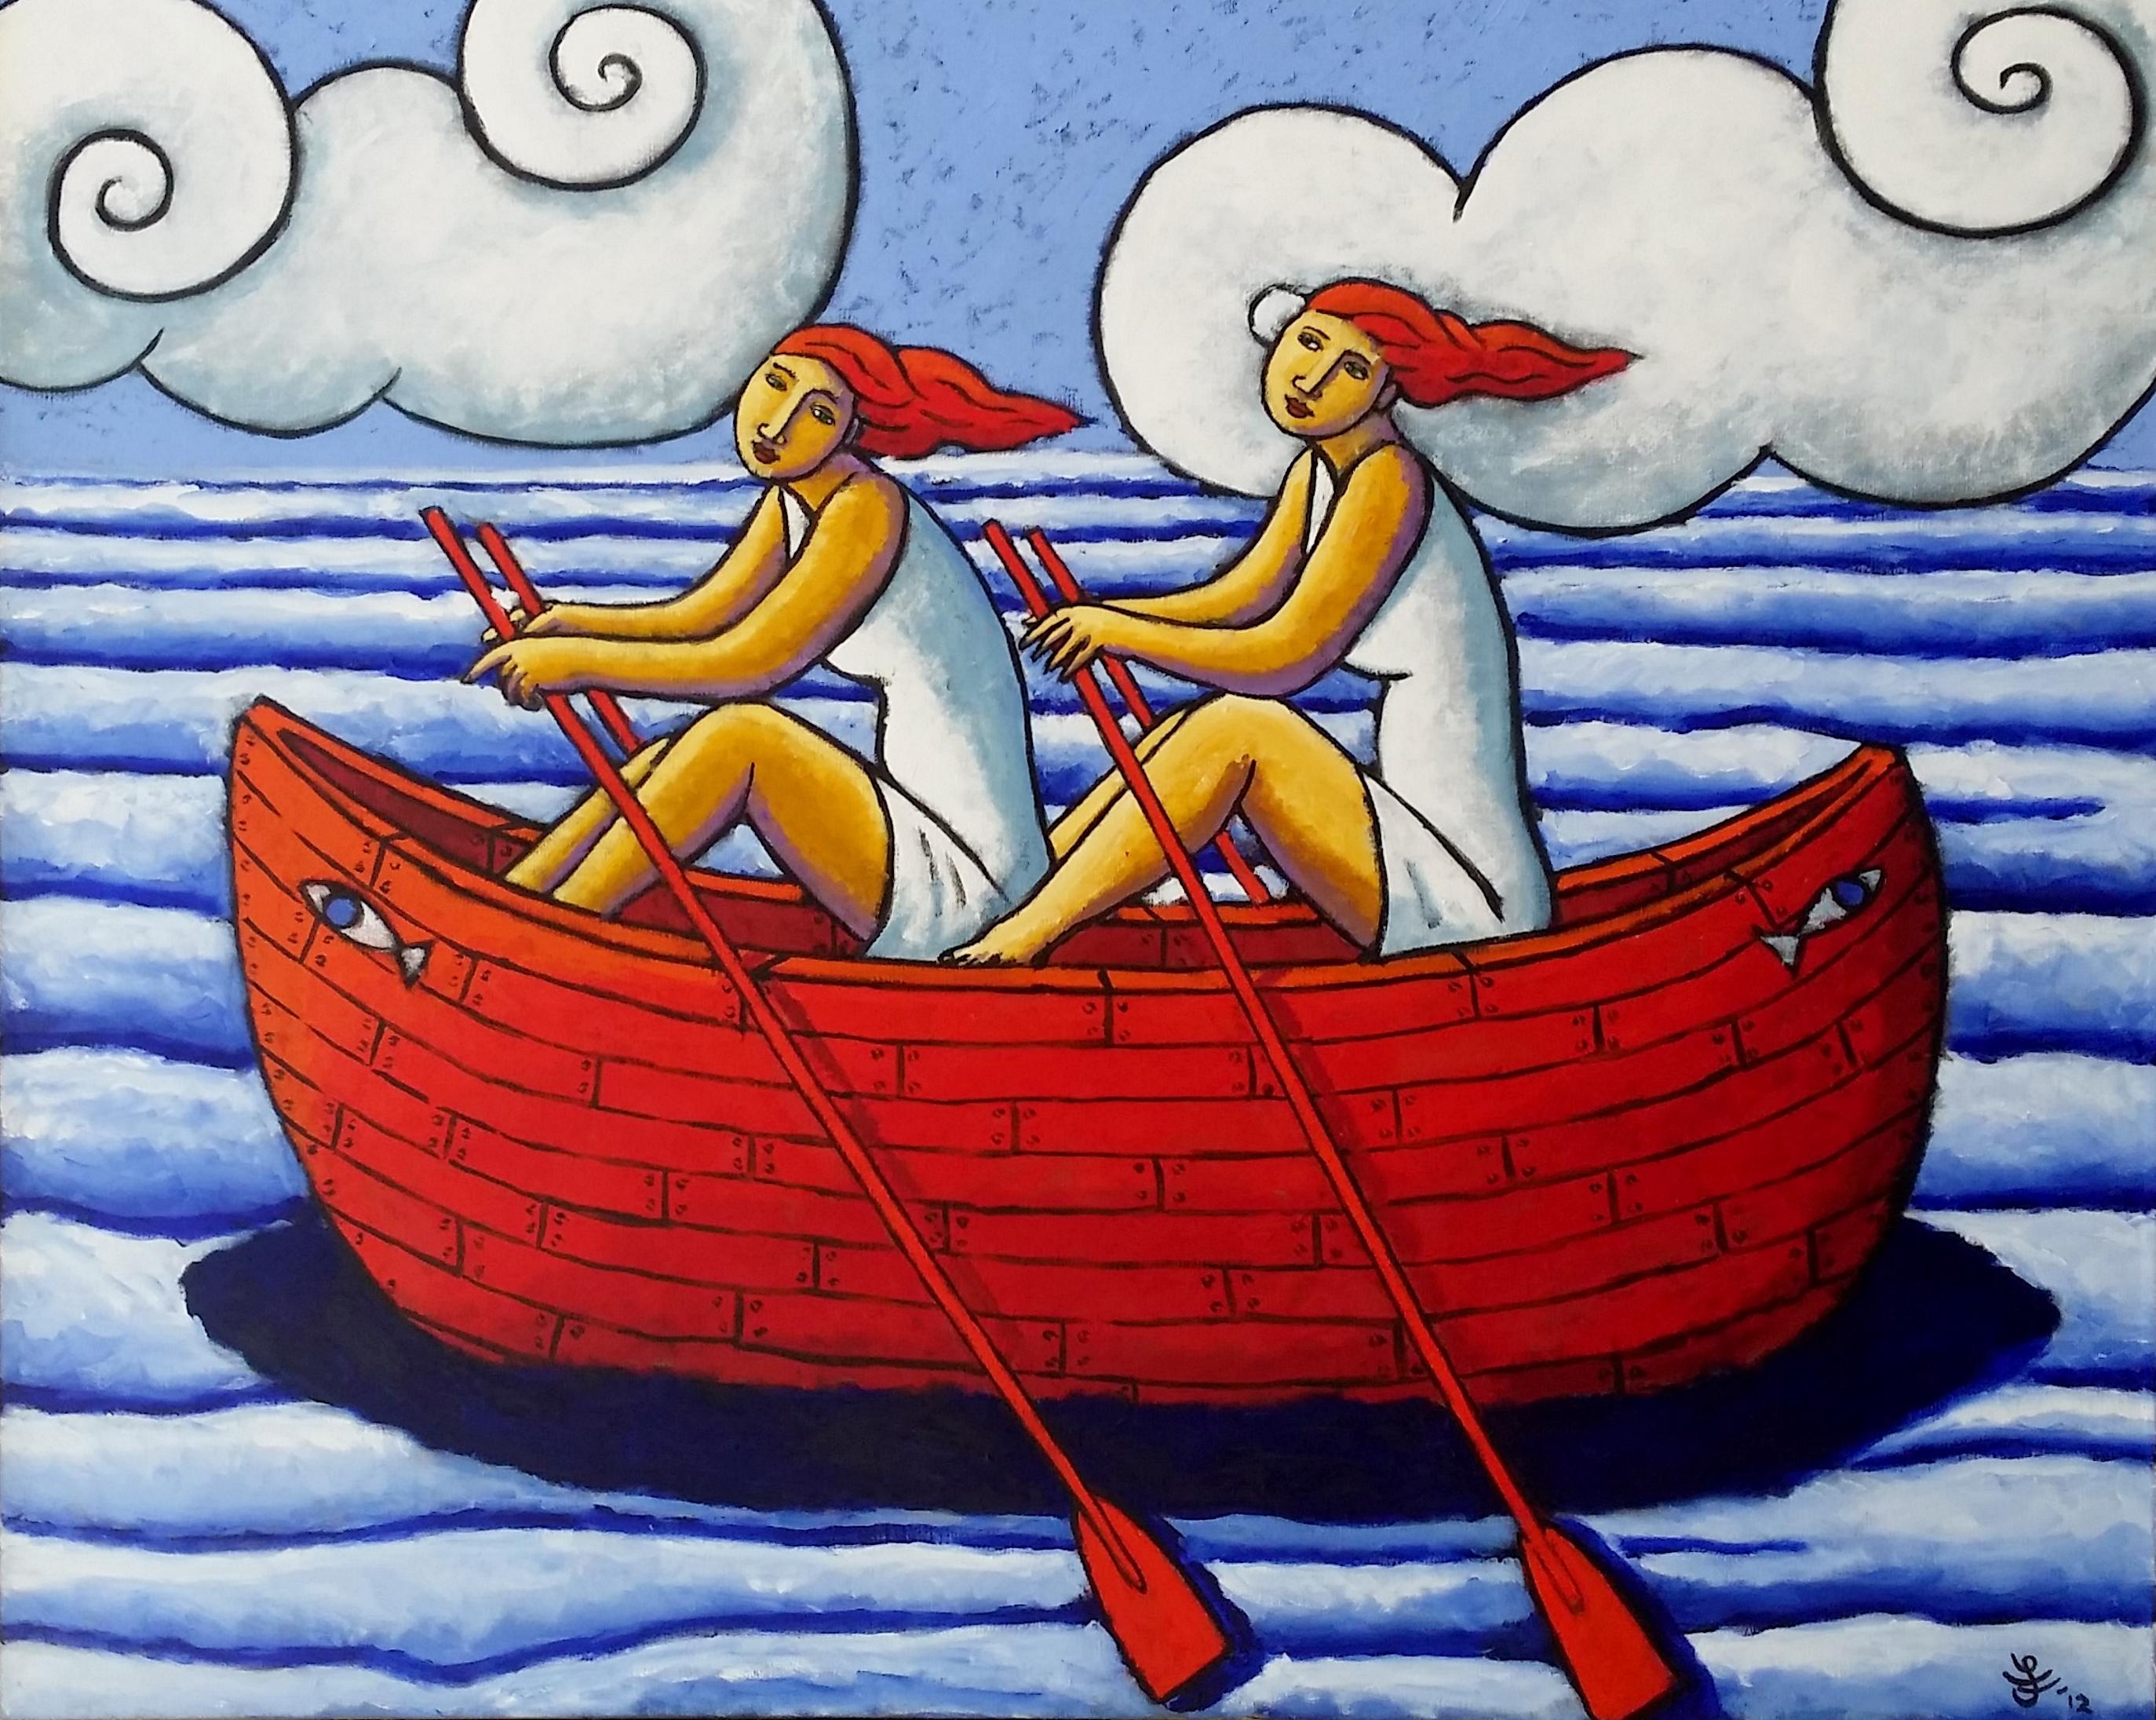 The Greek boat